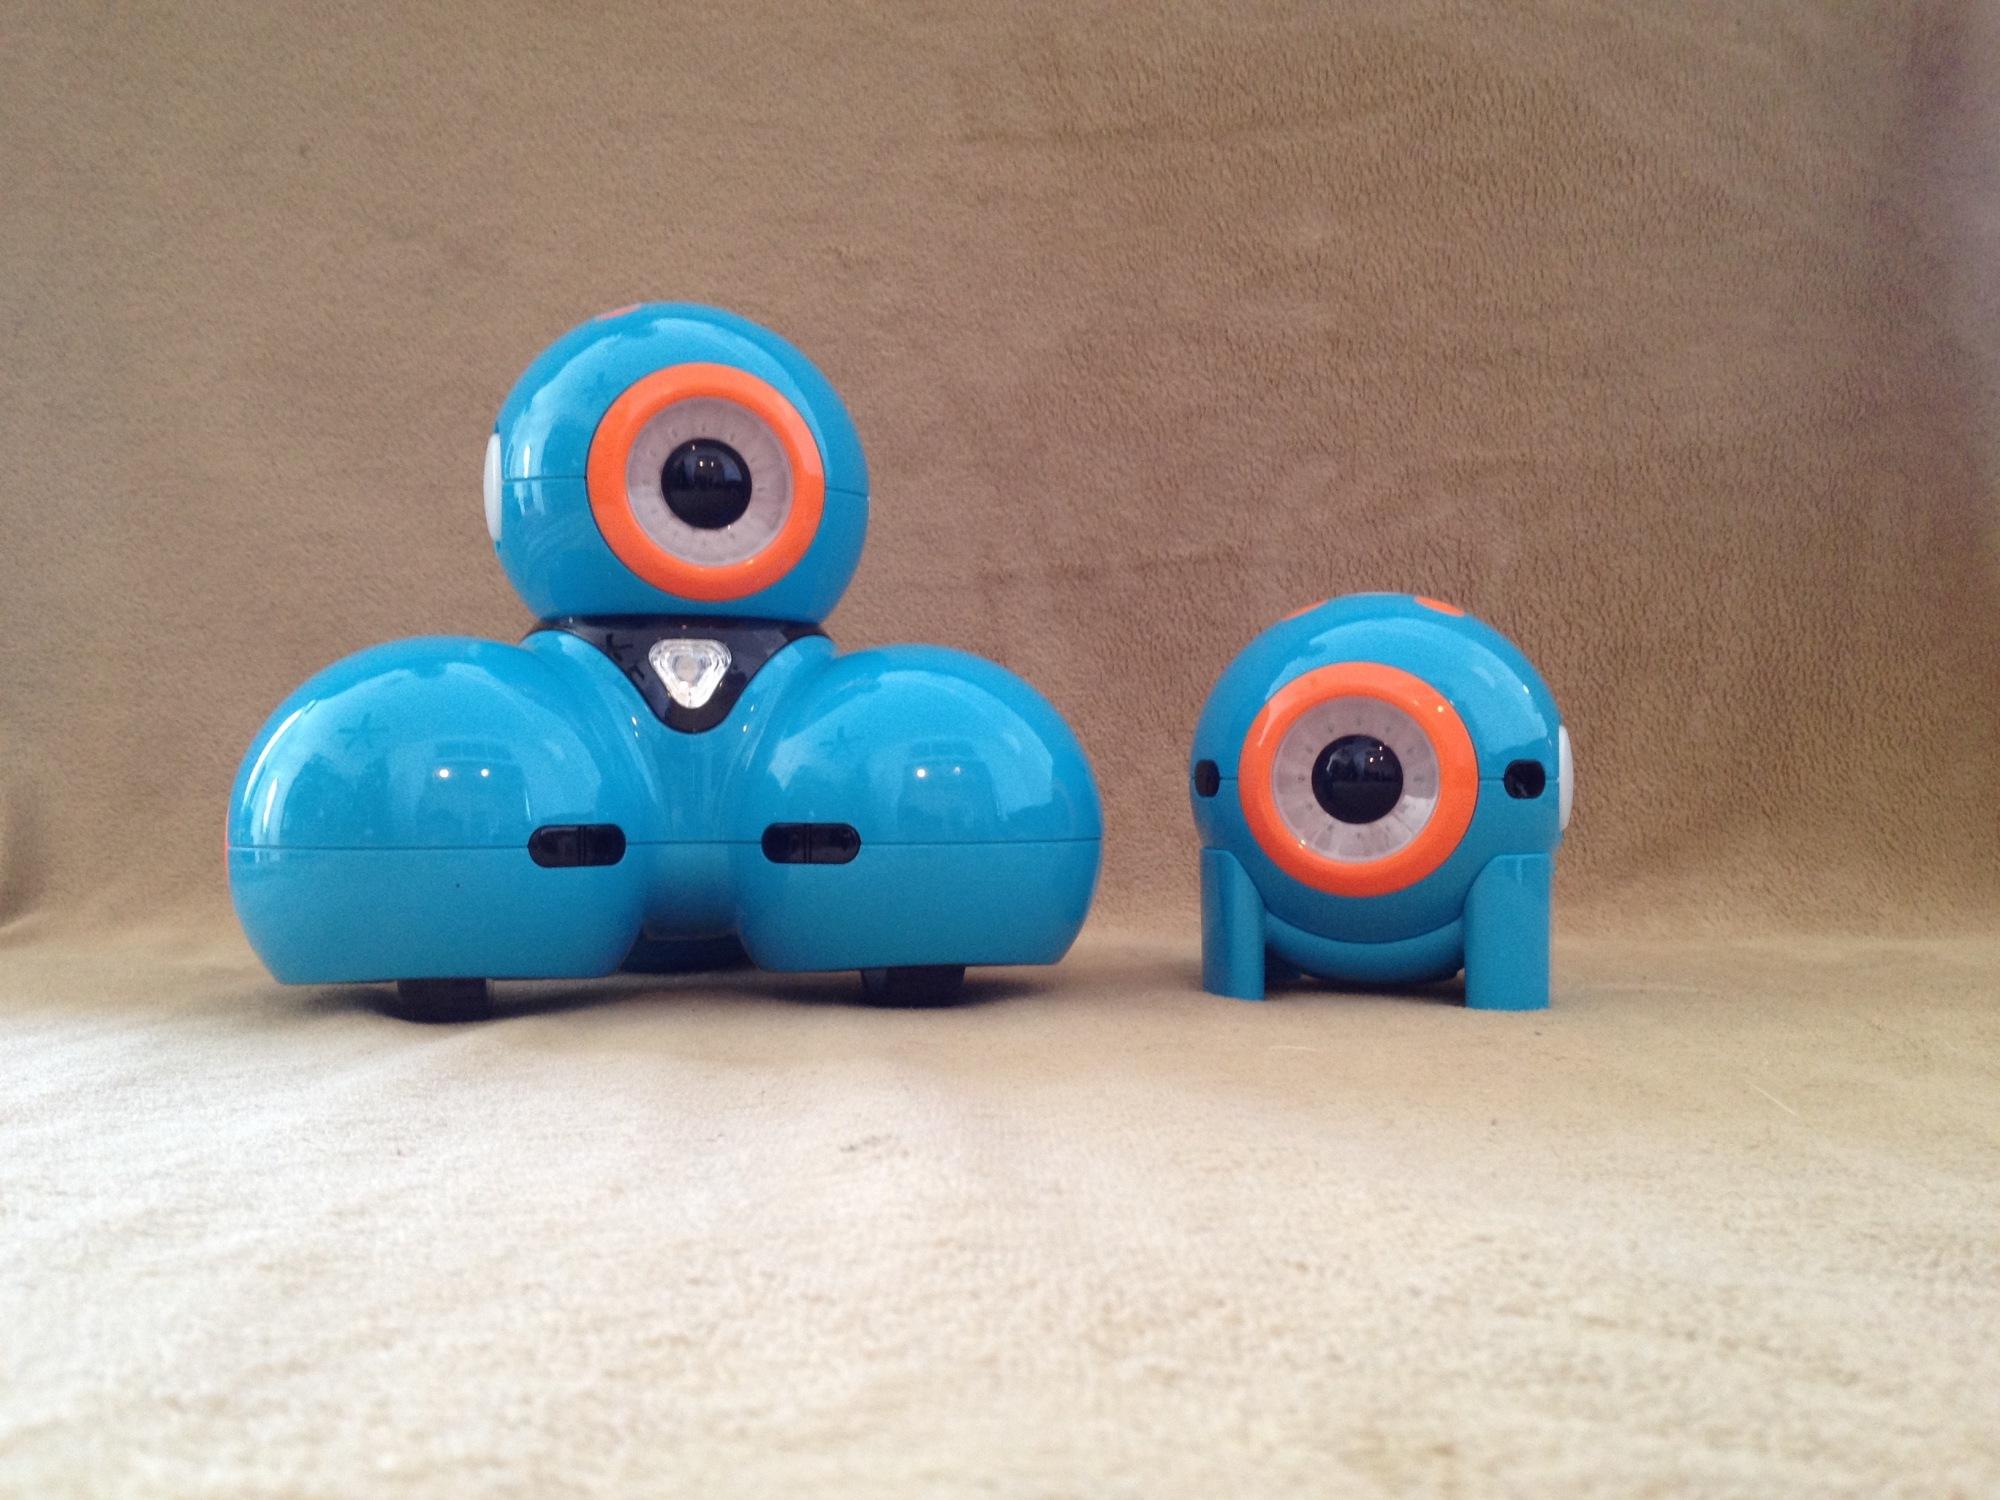 Kuazie and Blu